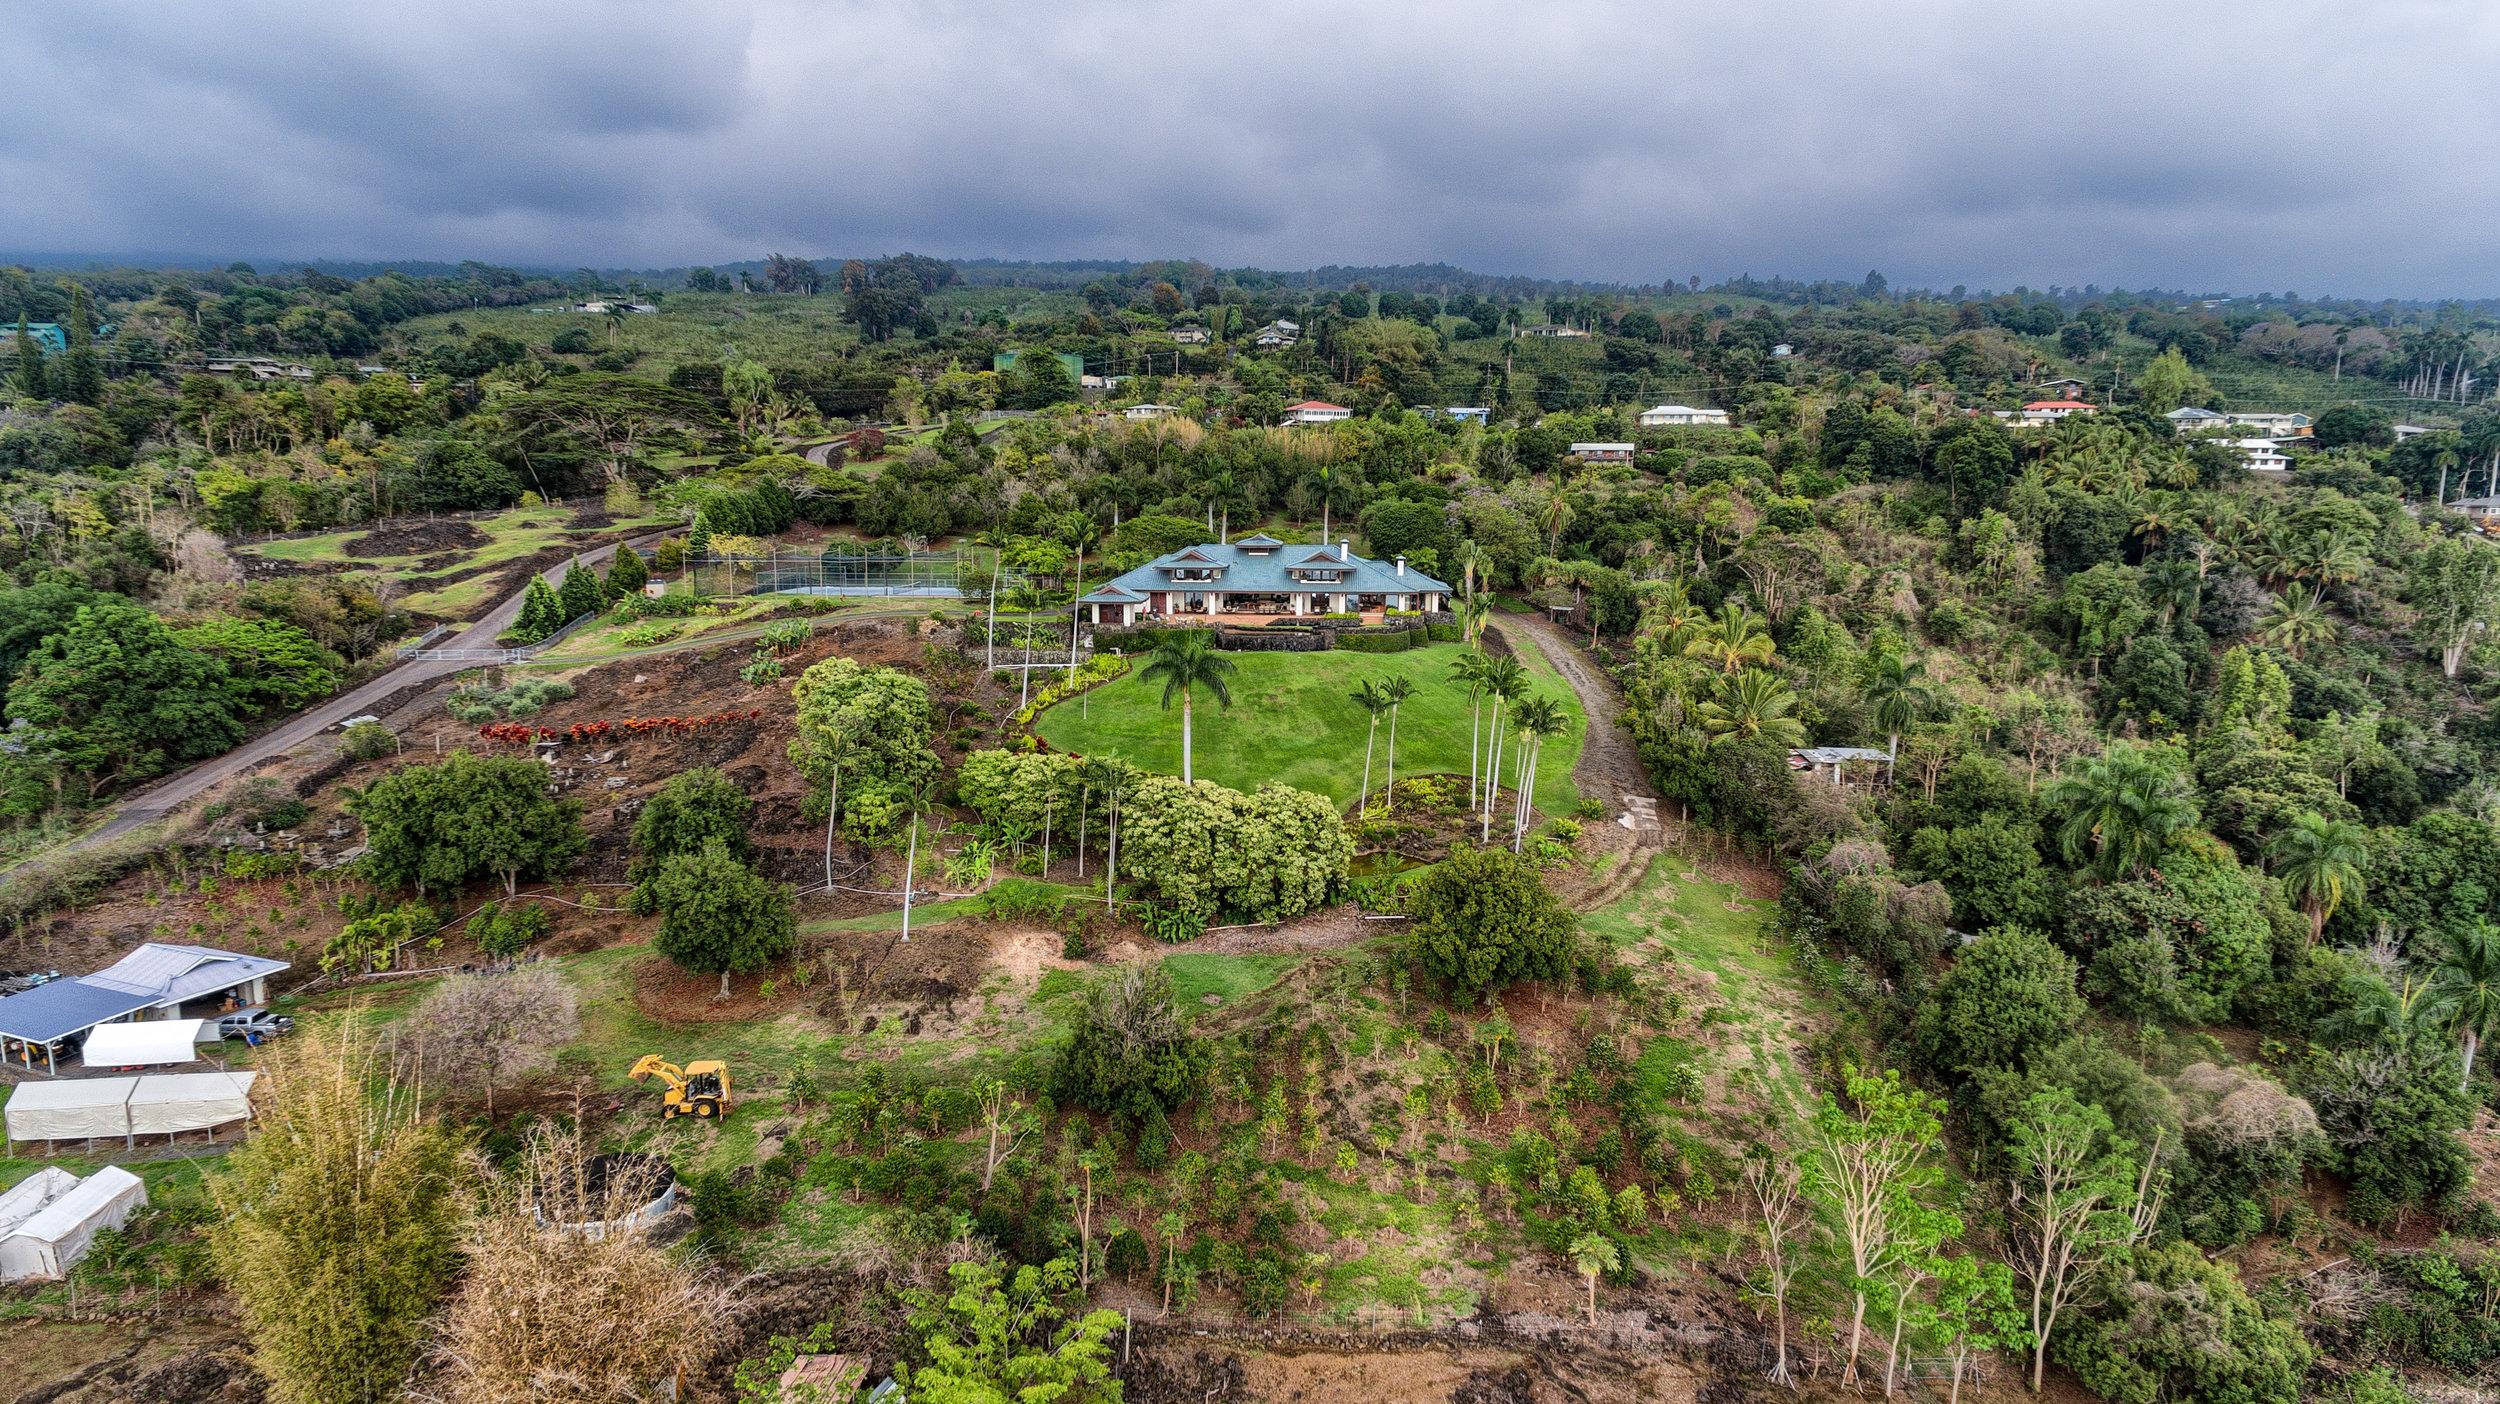 Holualoa   Mamalahoa Estate   $14.5 million   3BR/3.5BA   5,391 SF   90 acres   MLS#295006